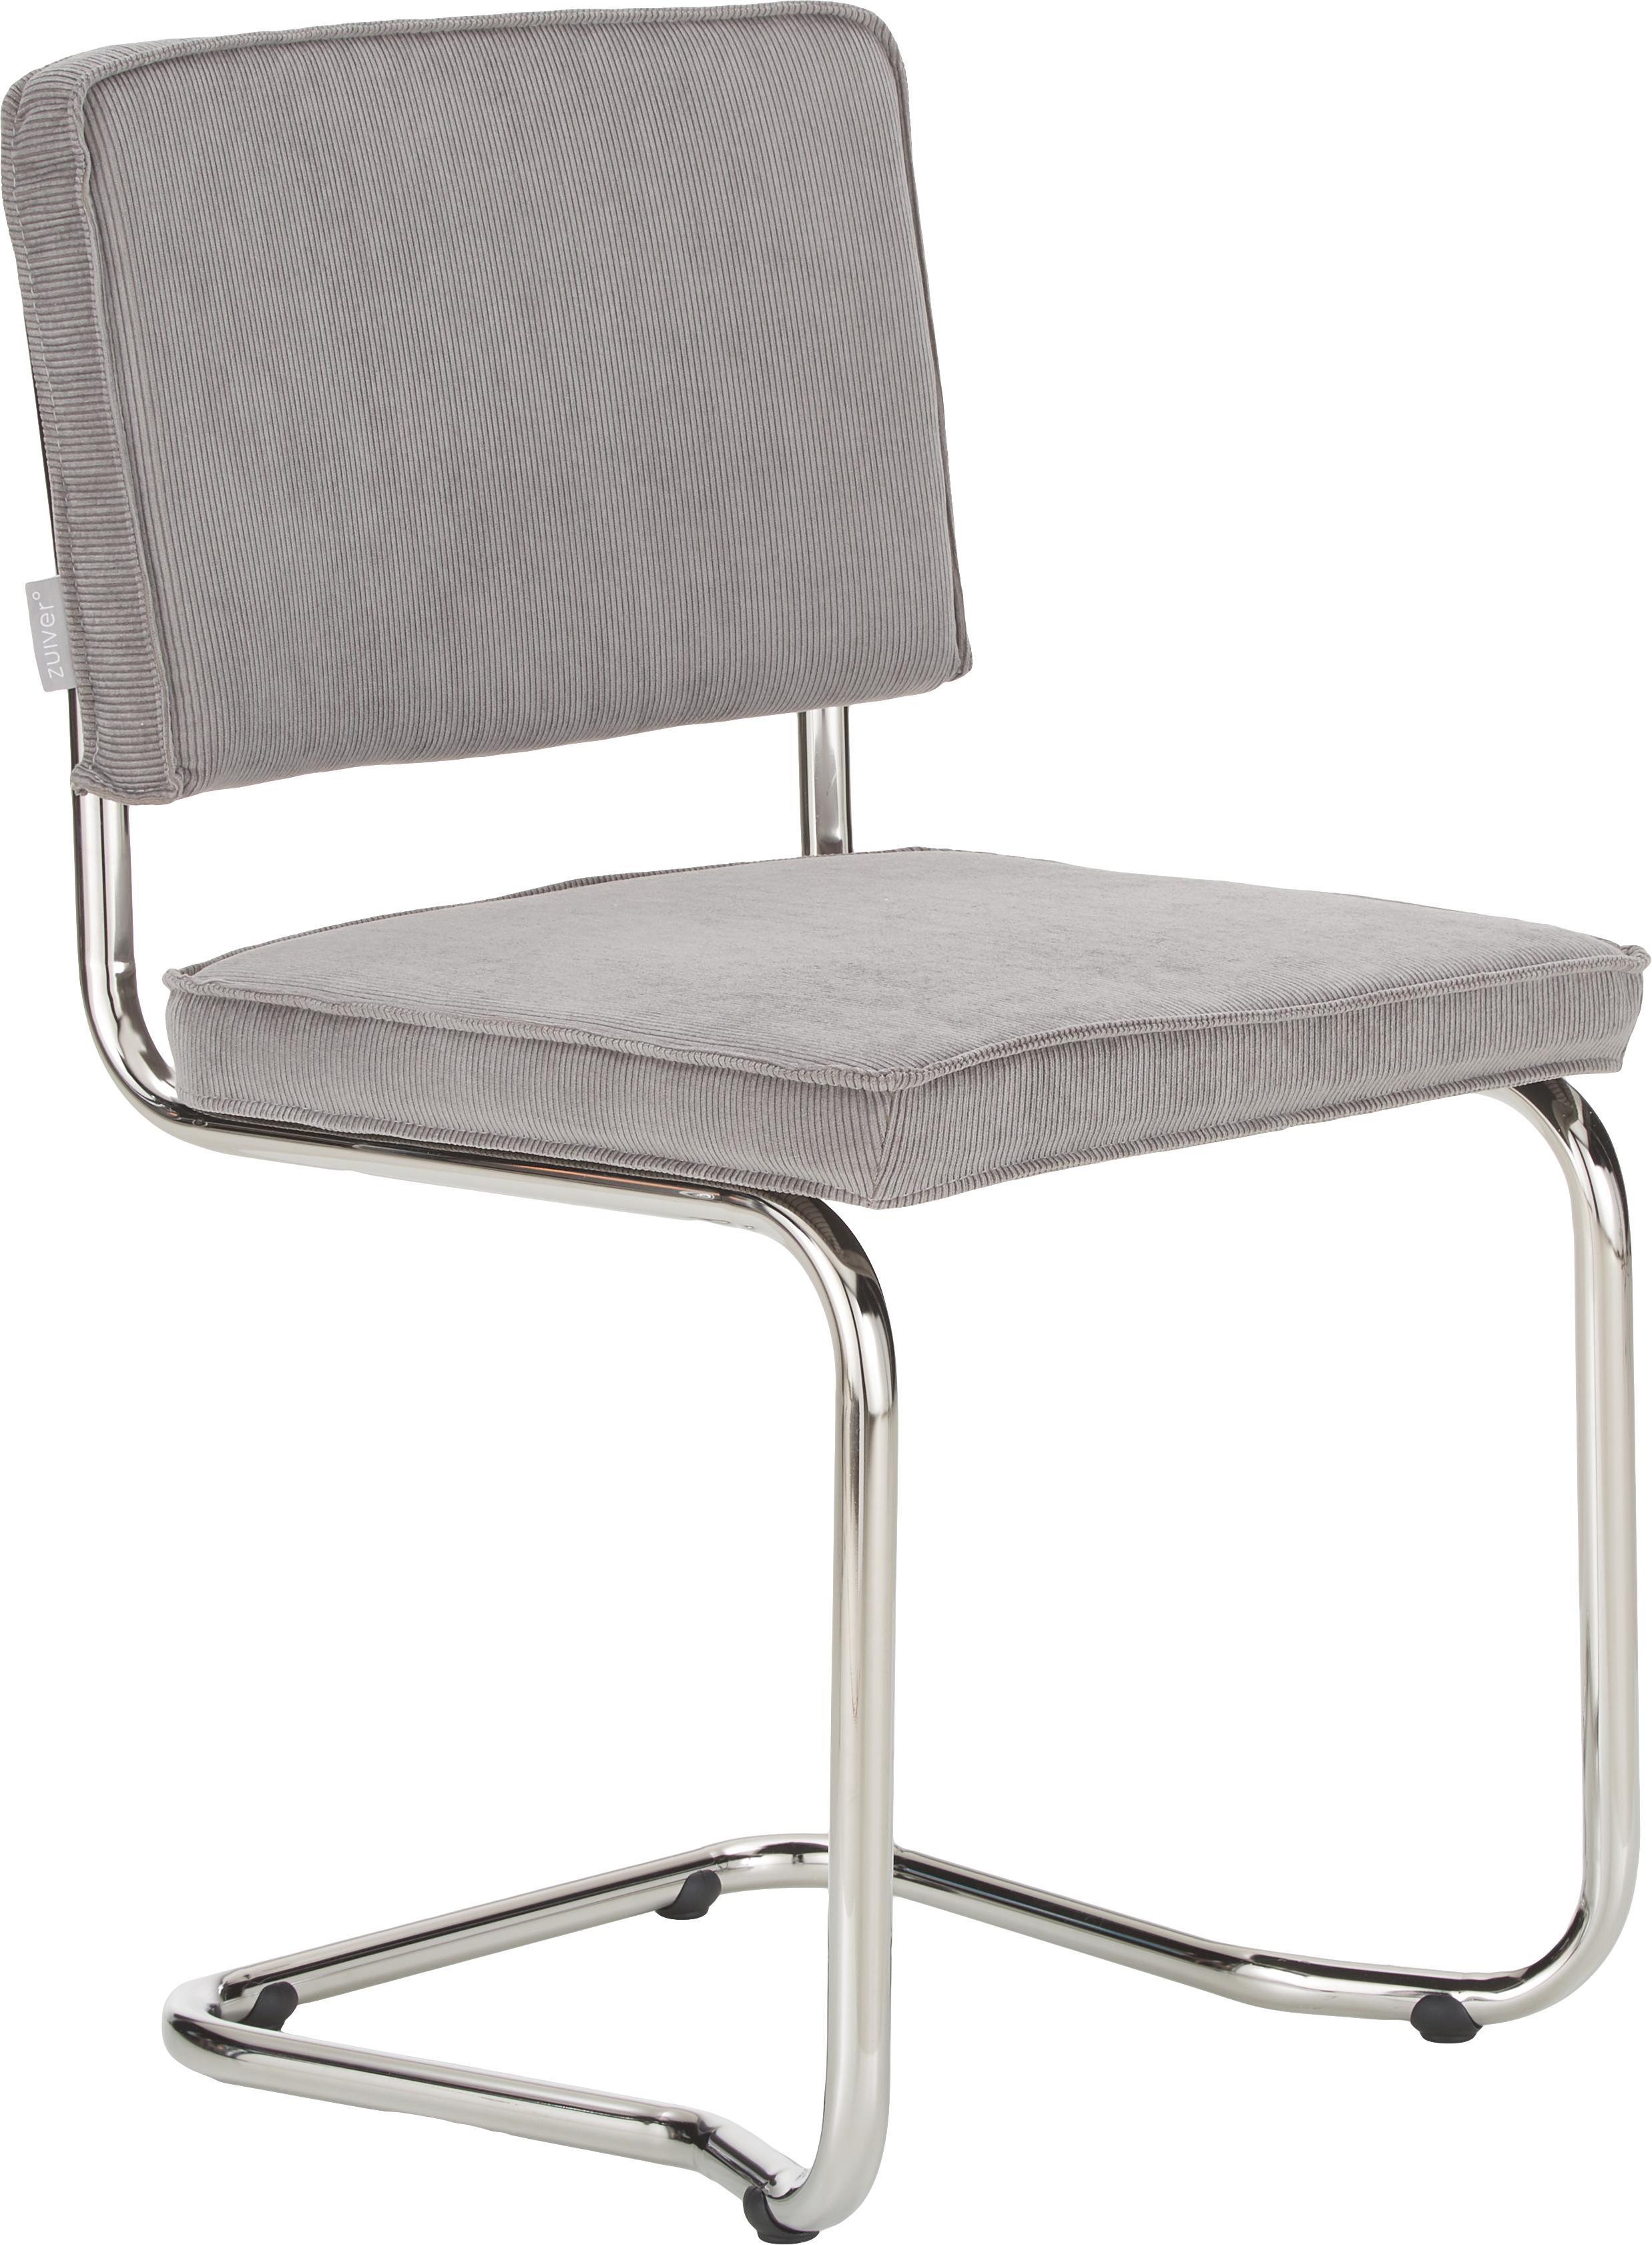 Silla cantilever Ridge Kink Chair, Tapizado: 88%nylon, 12%poliéster, Estructura: metal, cromado El tapizad, Pana gris clara, An 48 x F 48 cm